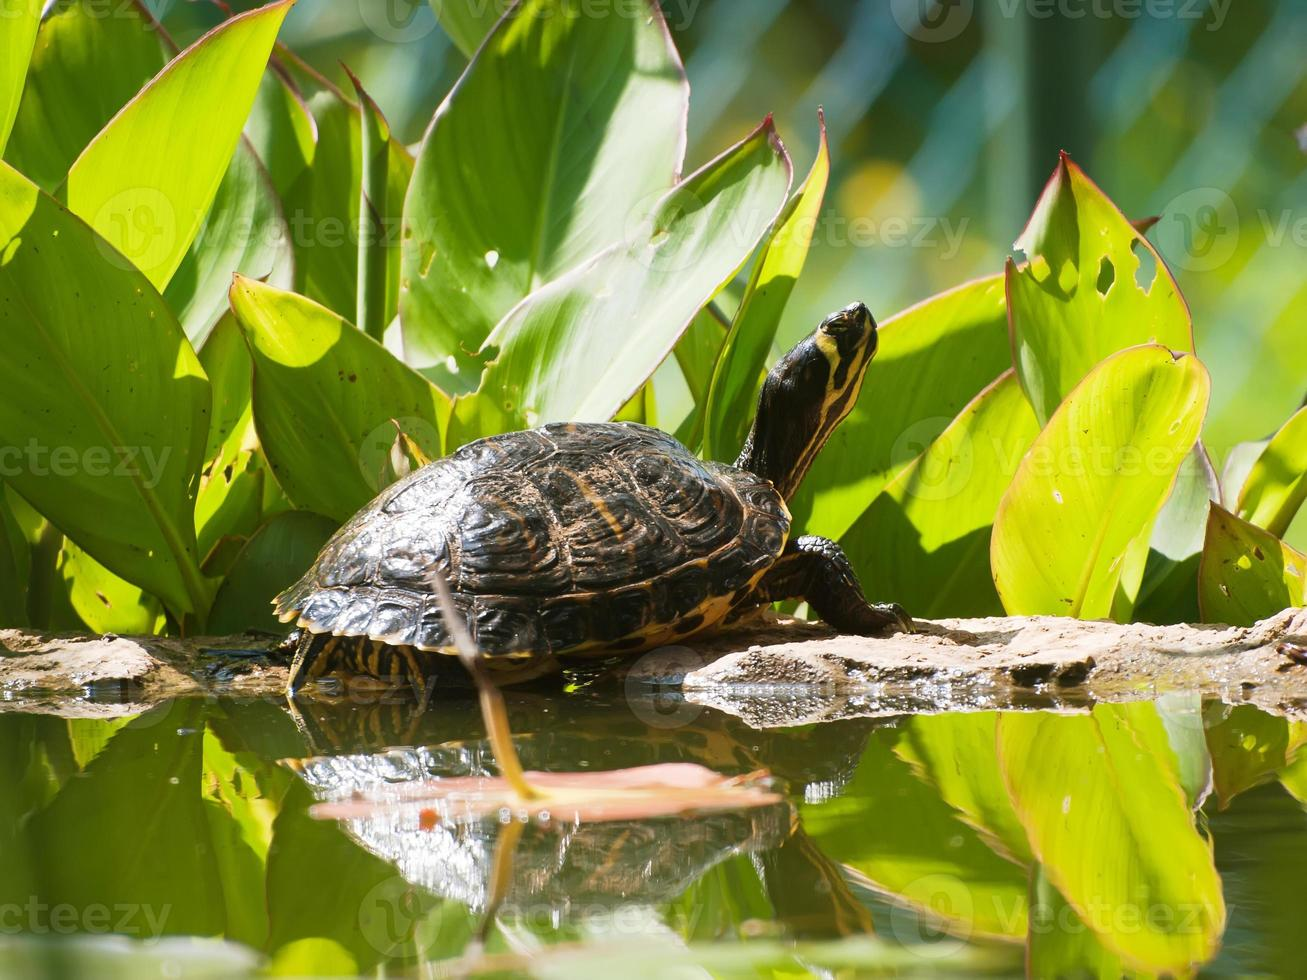 tortuga de estanque foto